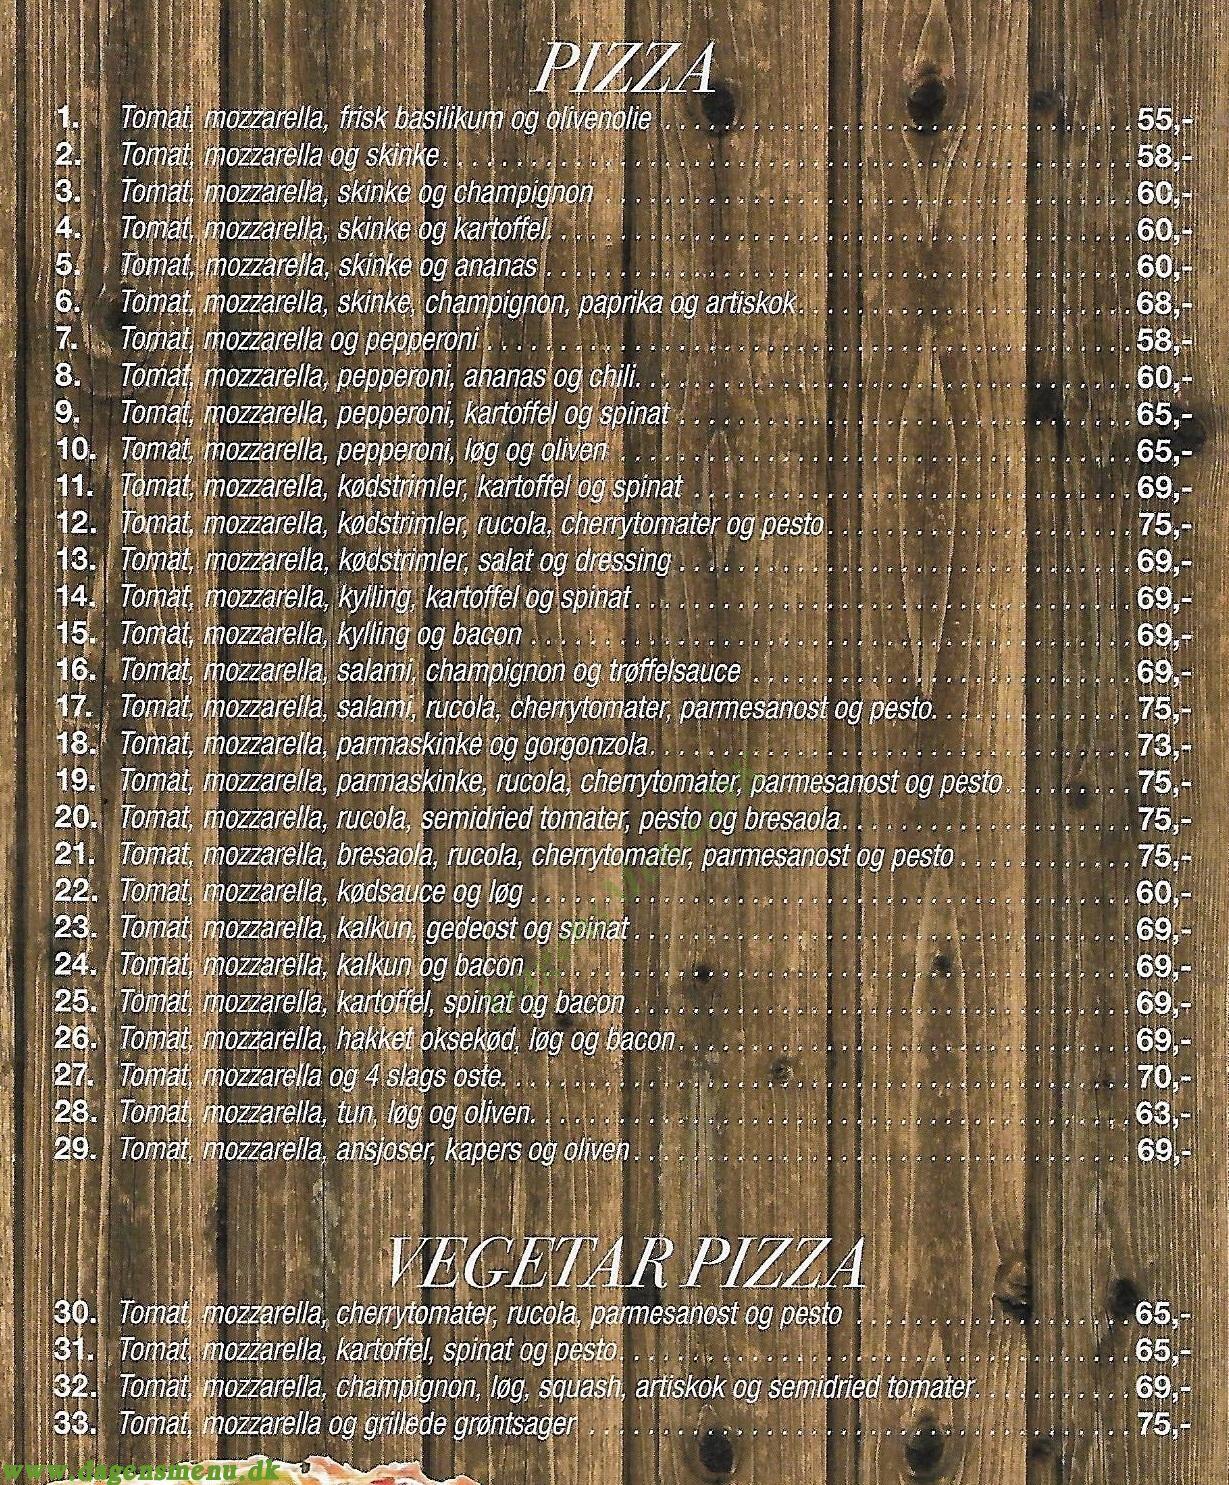 Scamorza Pizzeria - Menukort